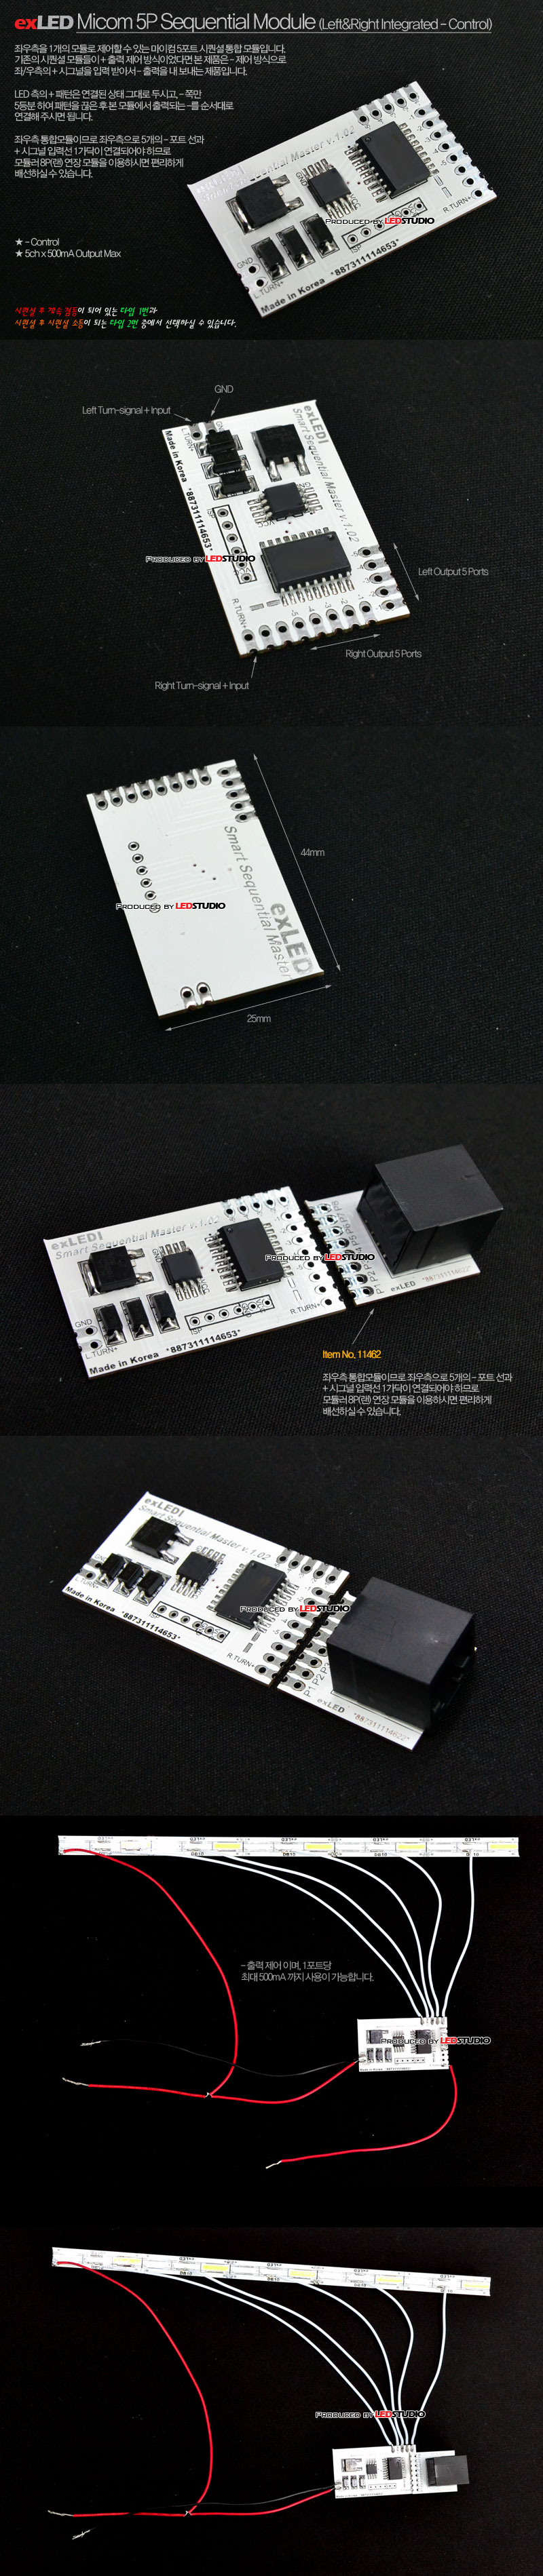 exLED 스마트 시퀀셜 마이컴 5포트 마스터 모듈 (좌우측 통합 -제어 모듈) (5chx500mA)